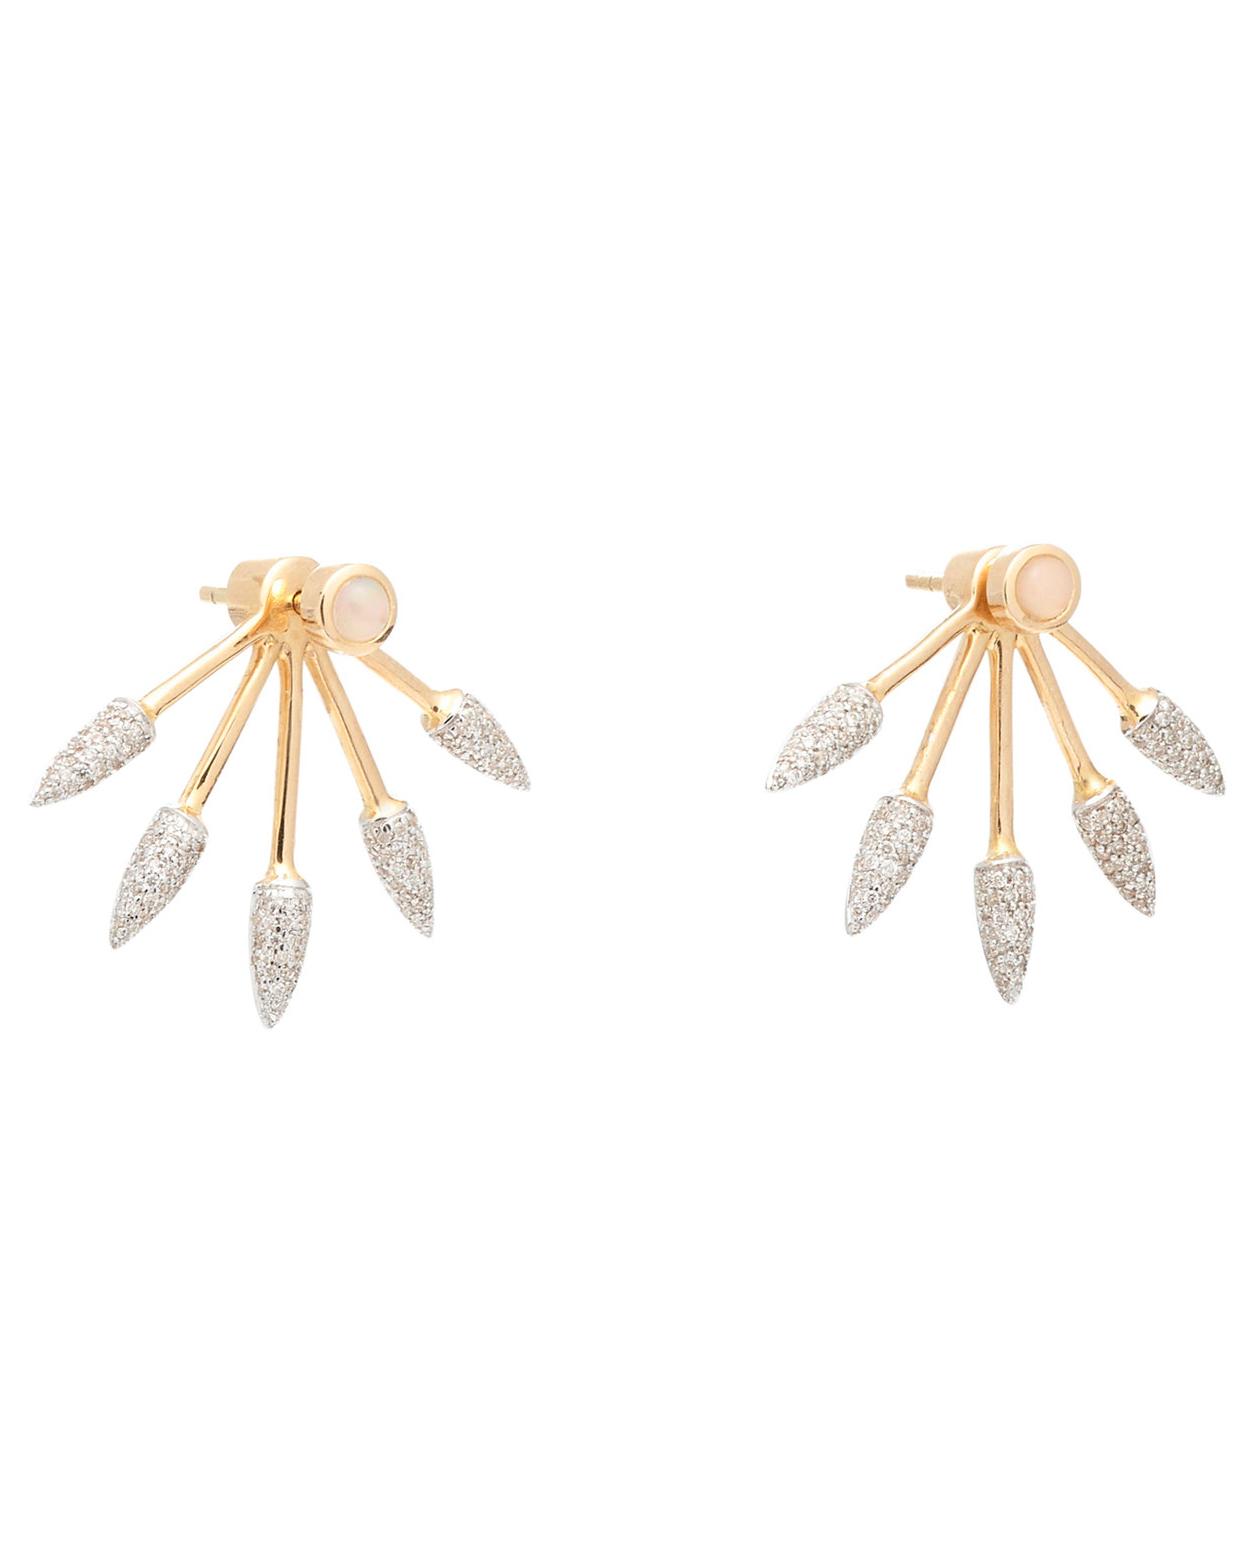 opal-earrings-pamela-love-barneys-0115.jpg